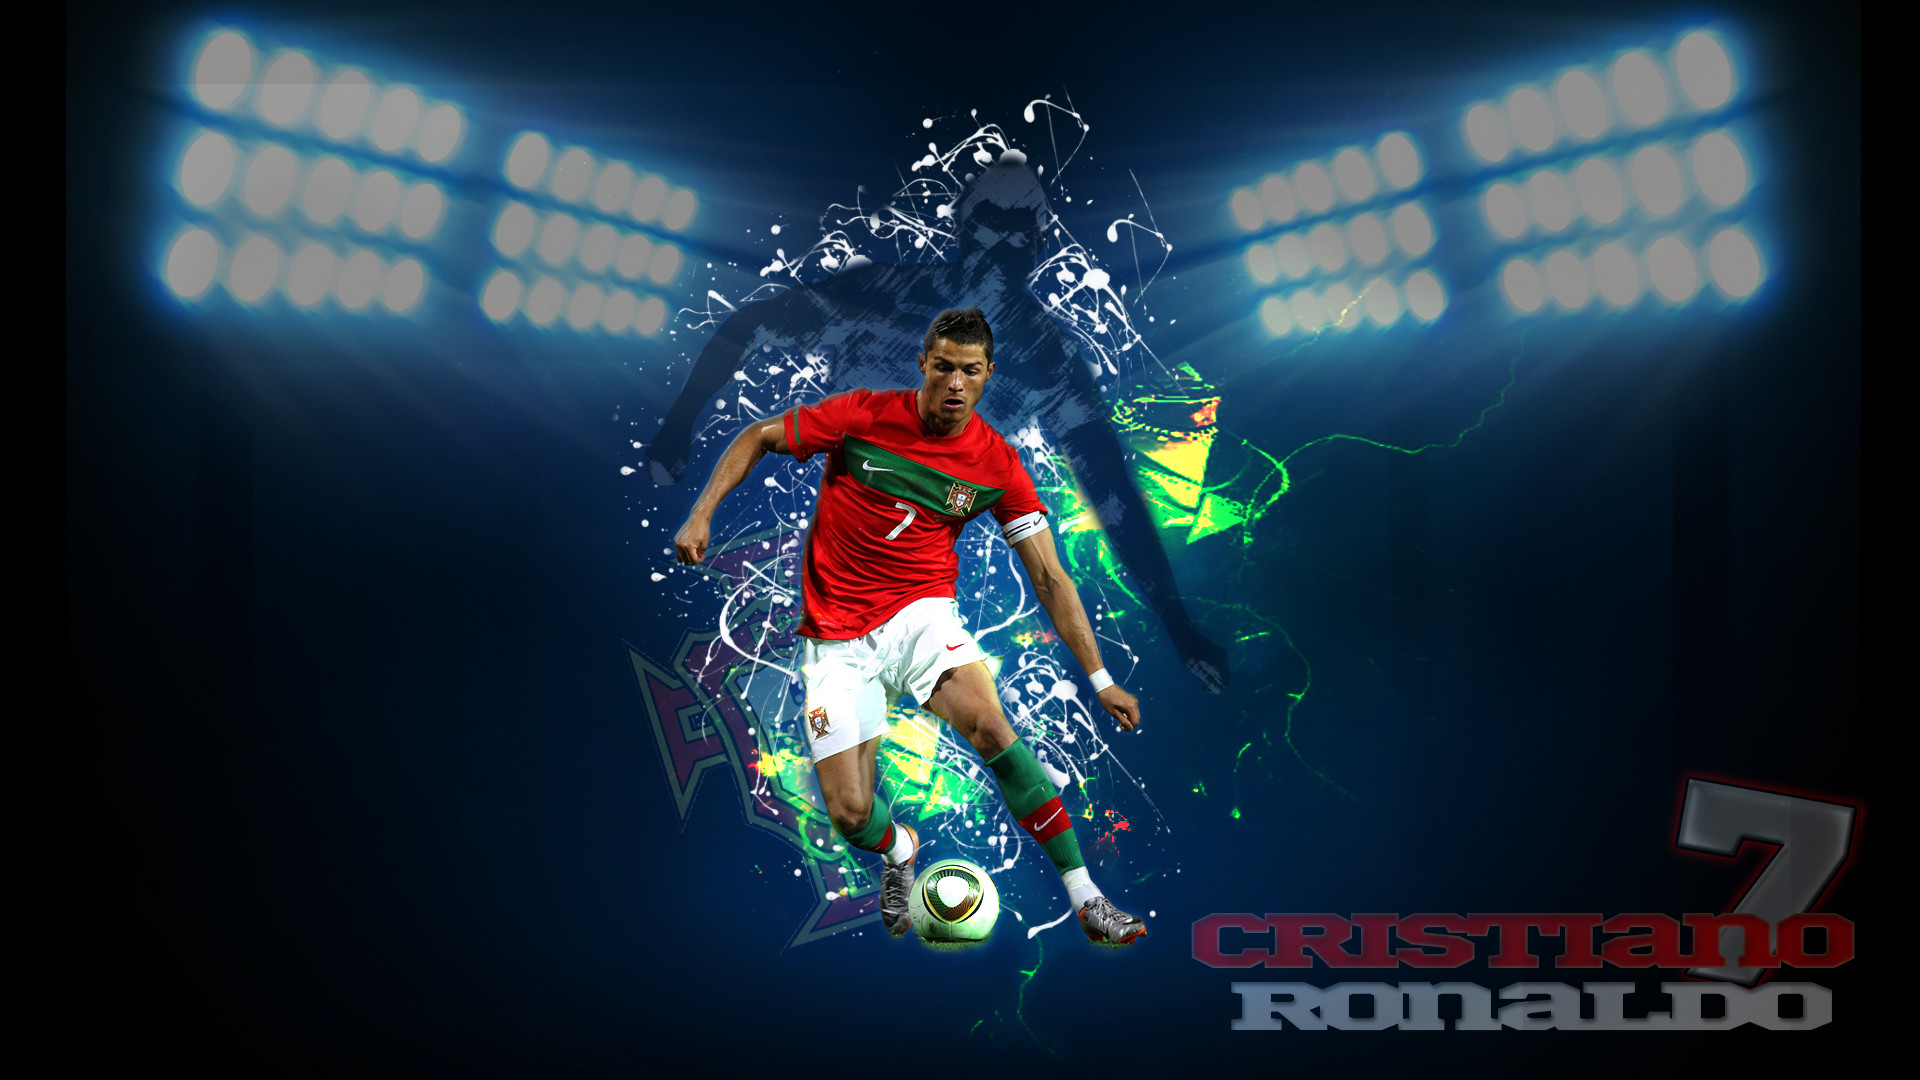 Cristiano Ronaldo Wallpaper 2018 Nike 61 Images